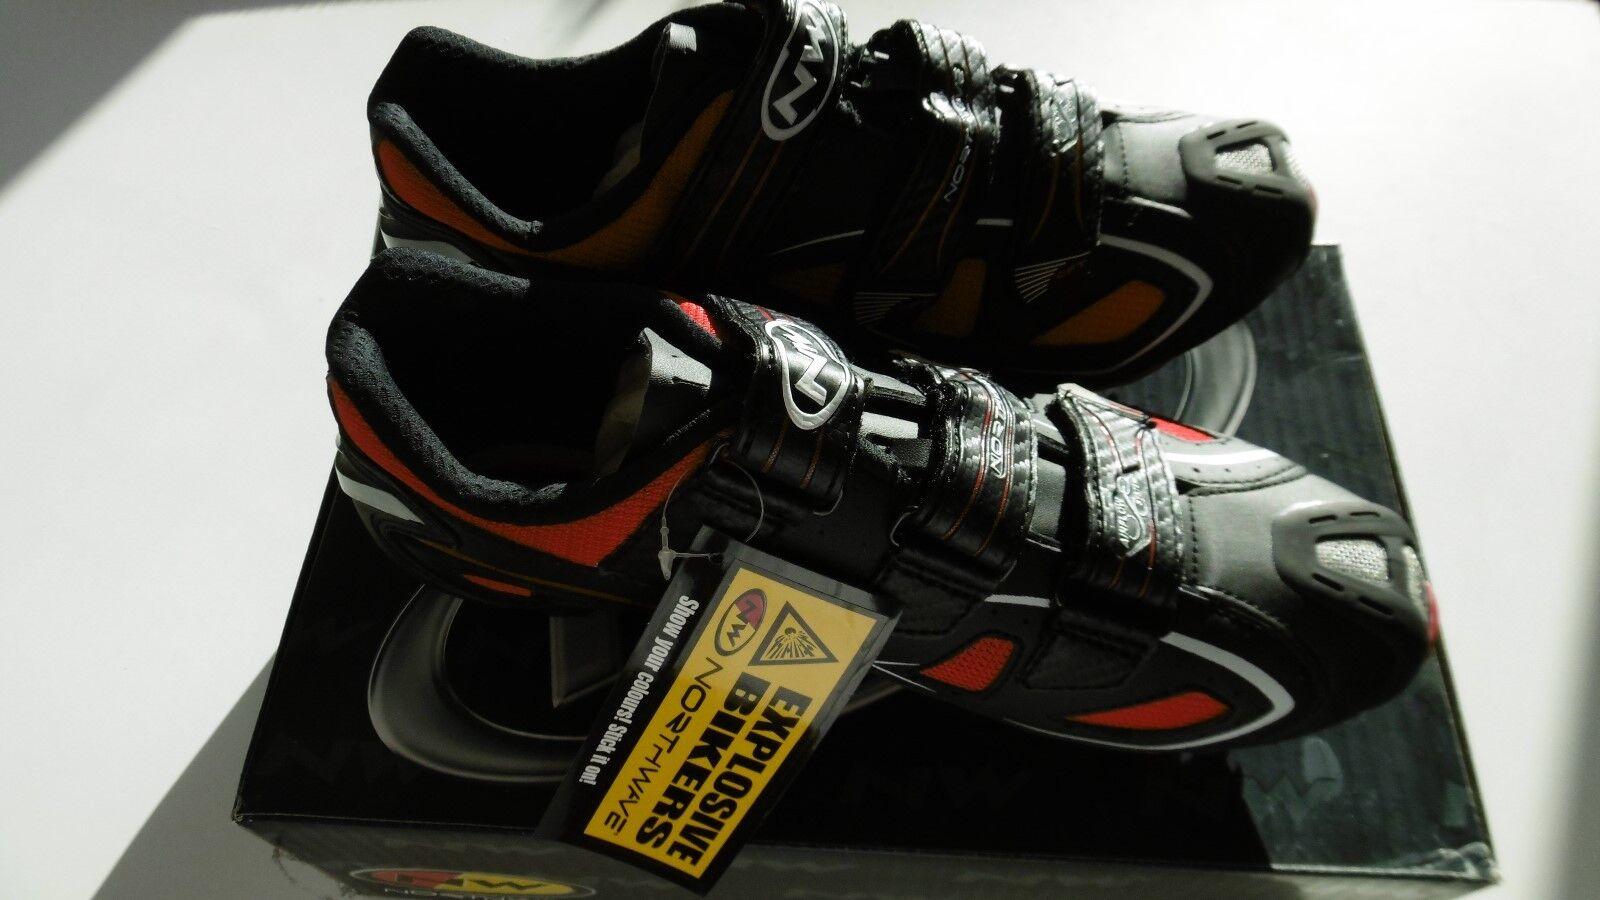 Northwave Rebel 3V Black/Red Shoes Size 45 New In Box